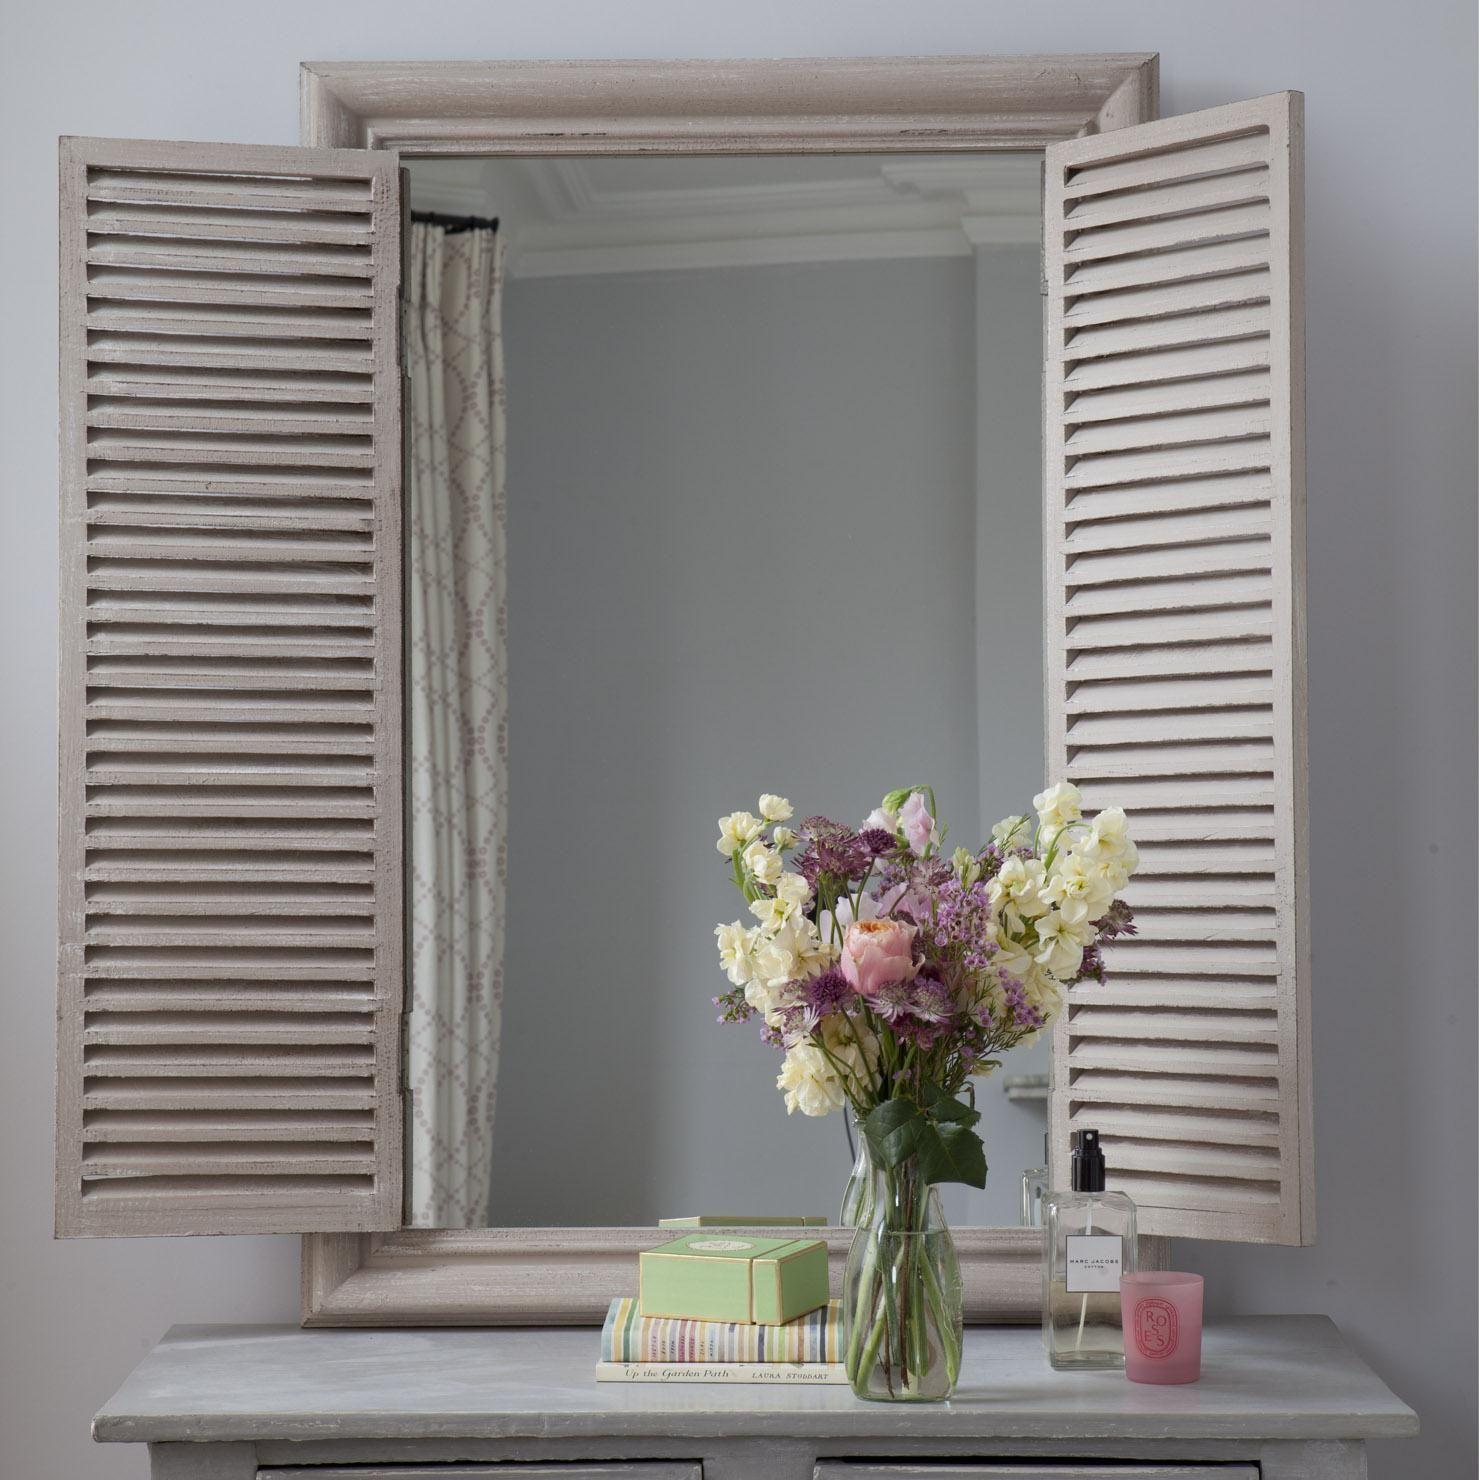 Discount Homegoods: Shutters, Mirror, Diy Mirror